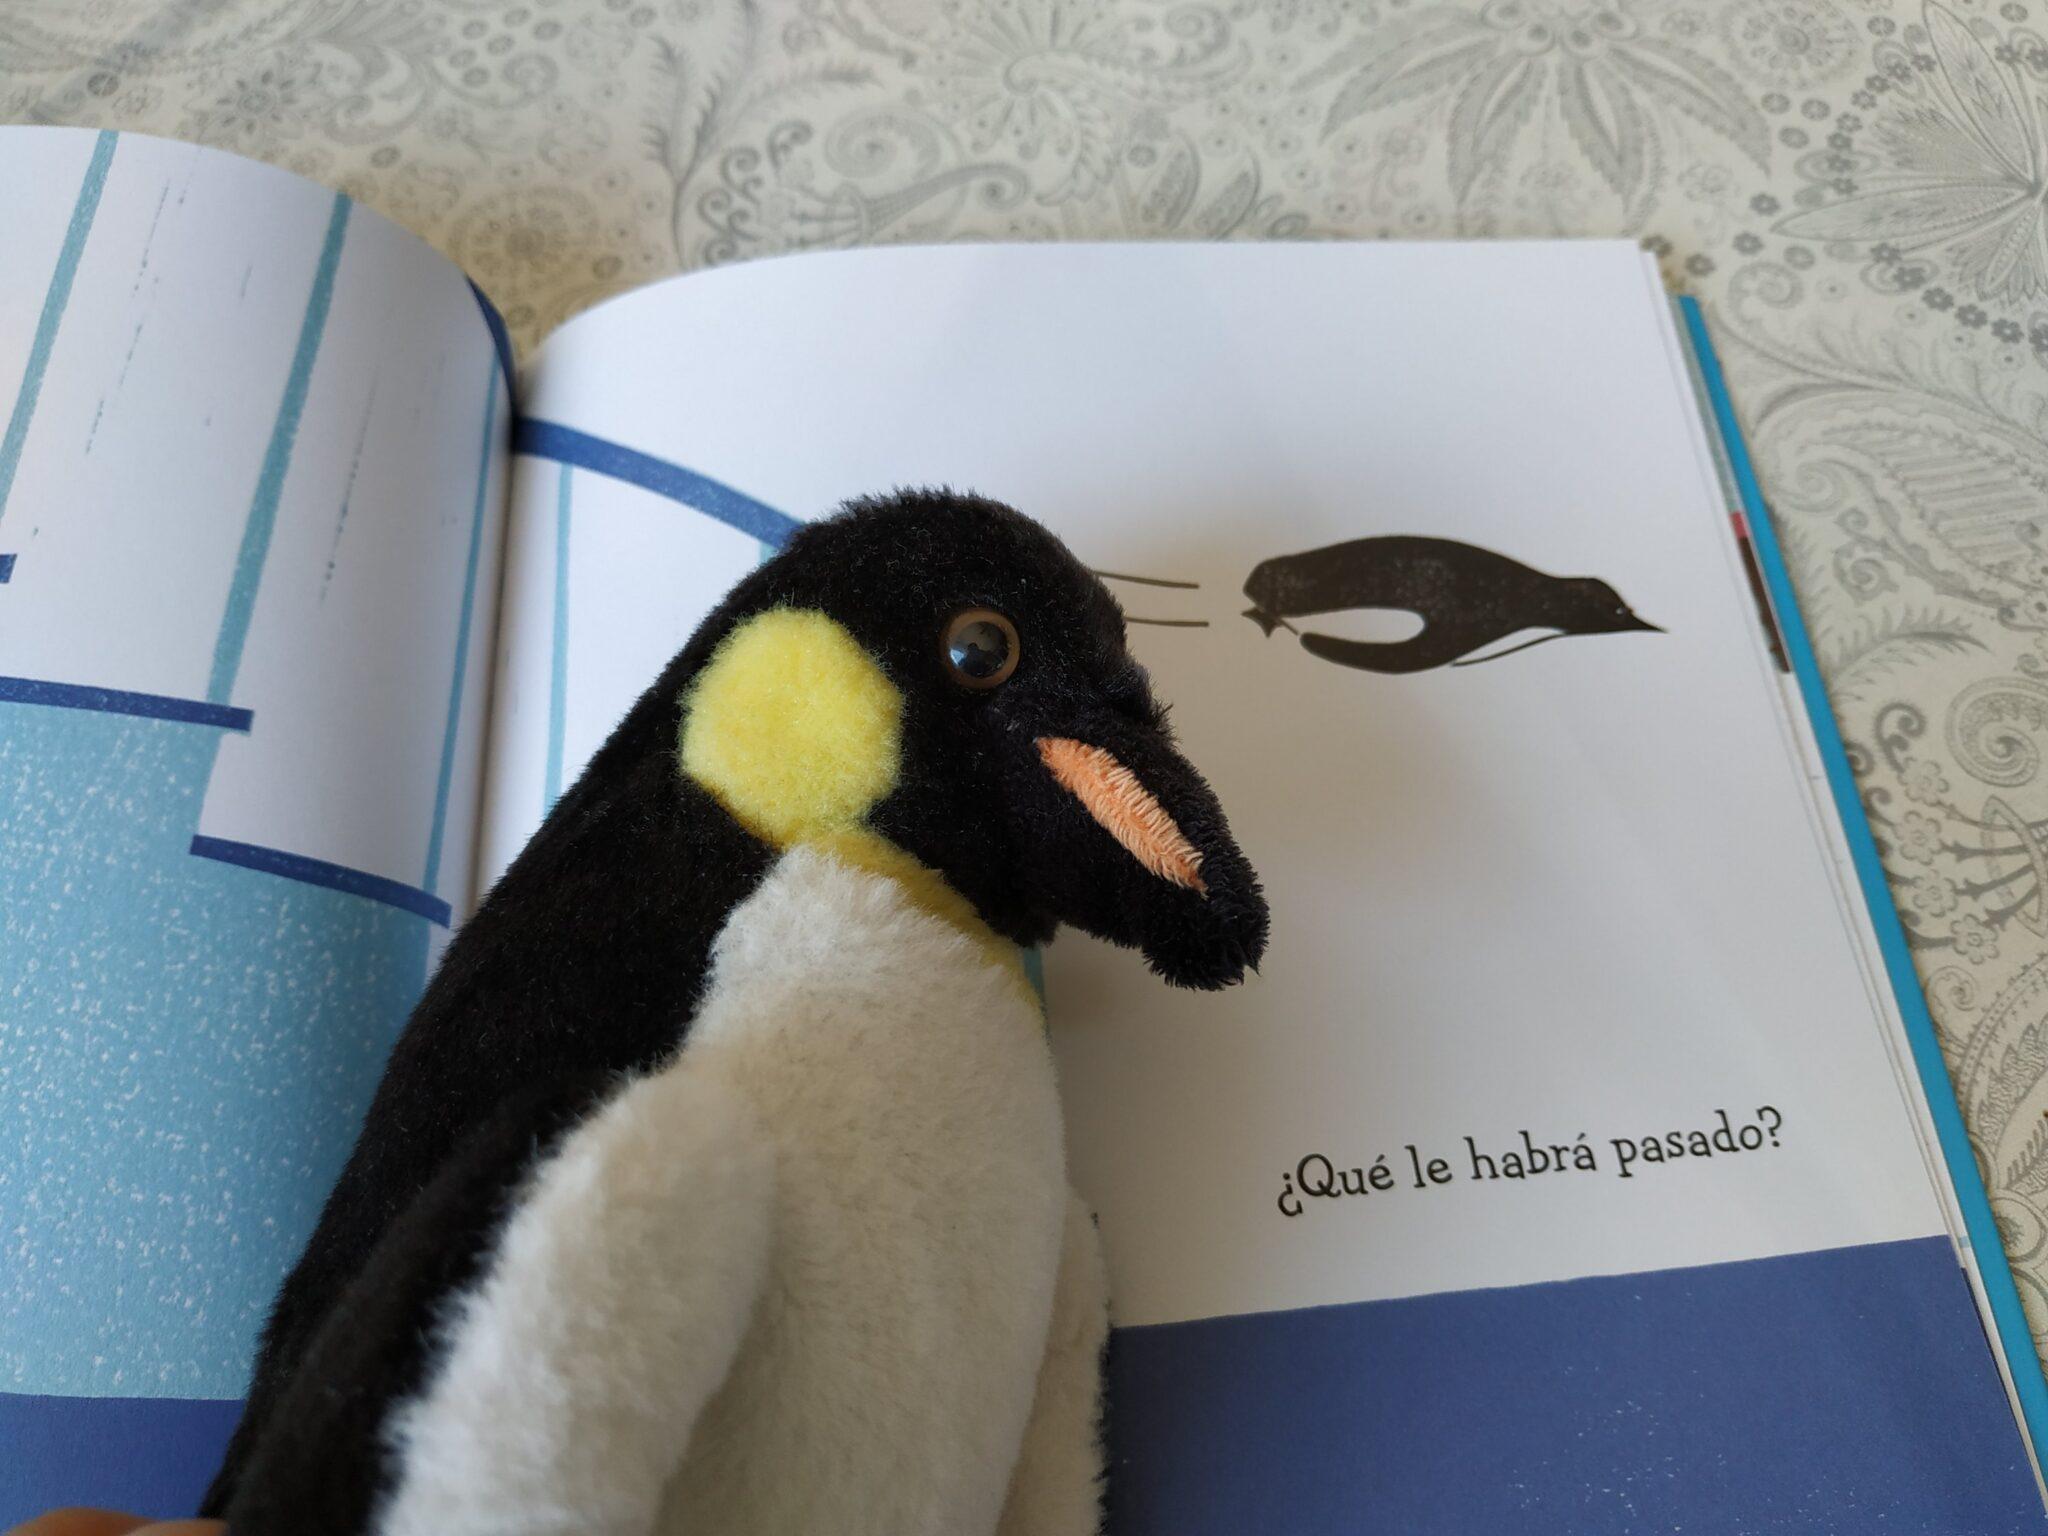 img 20191115 1133532282799695027968213 scaled - Mi abuelo es un pingüino